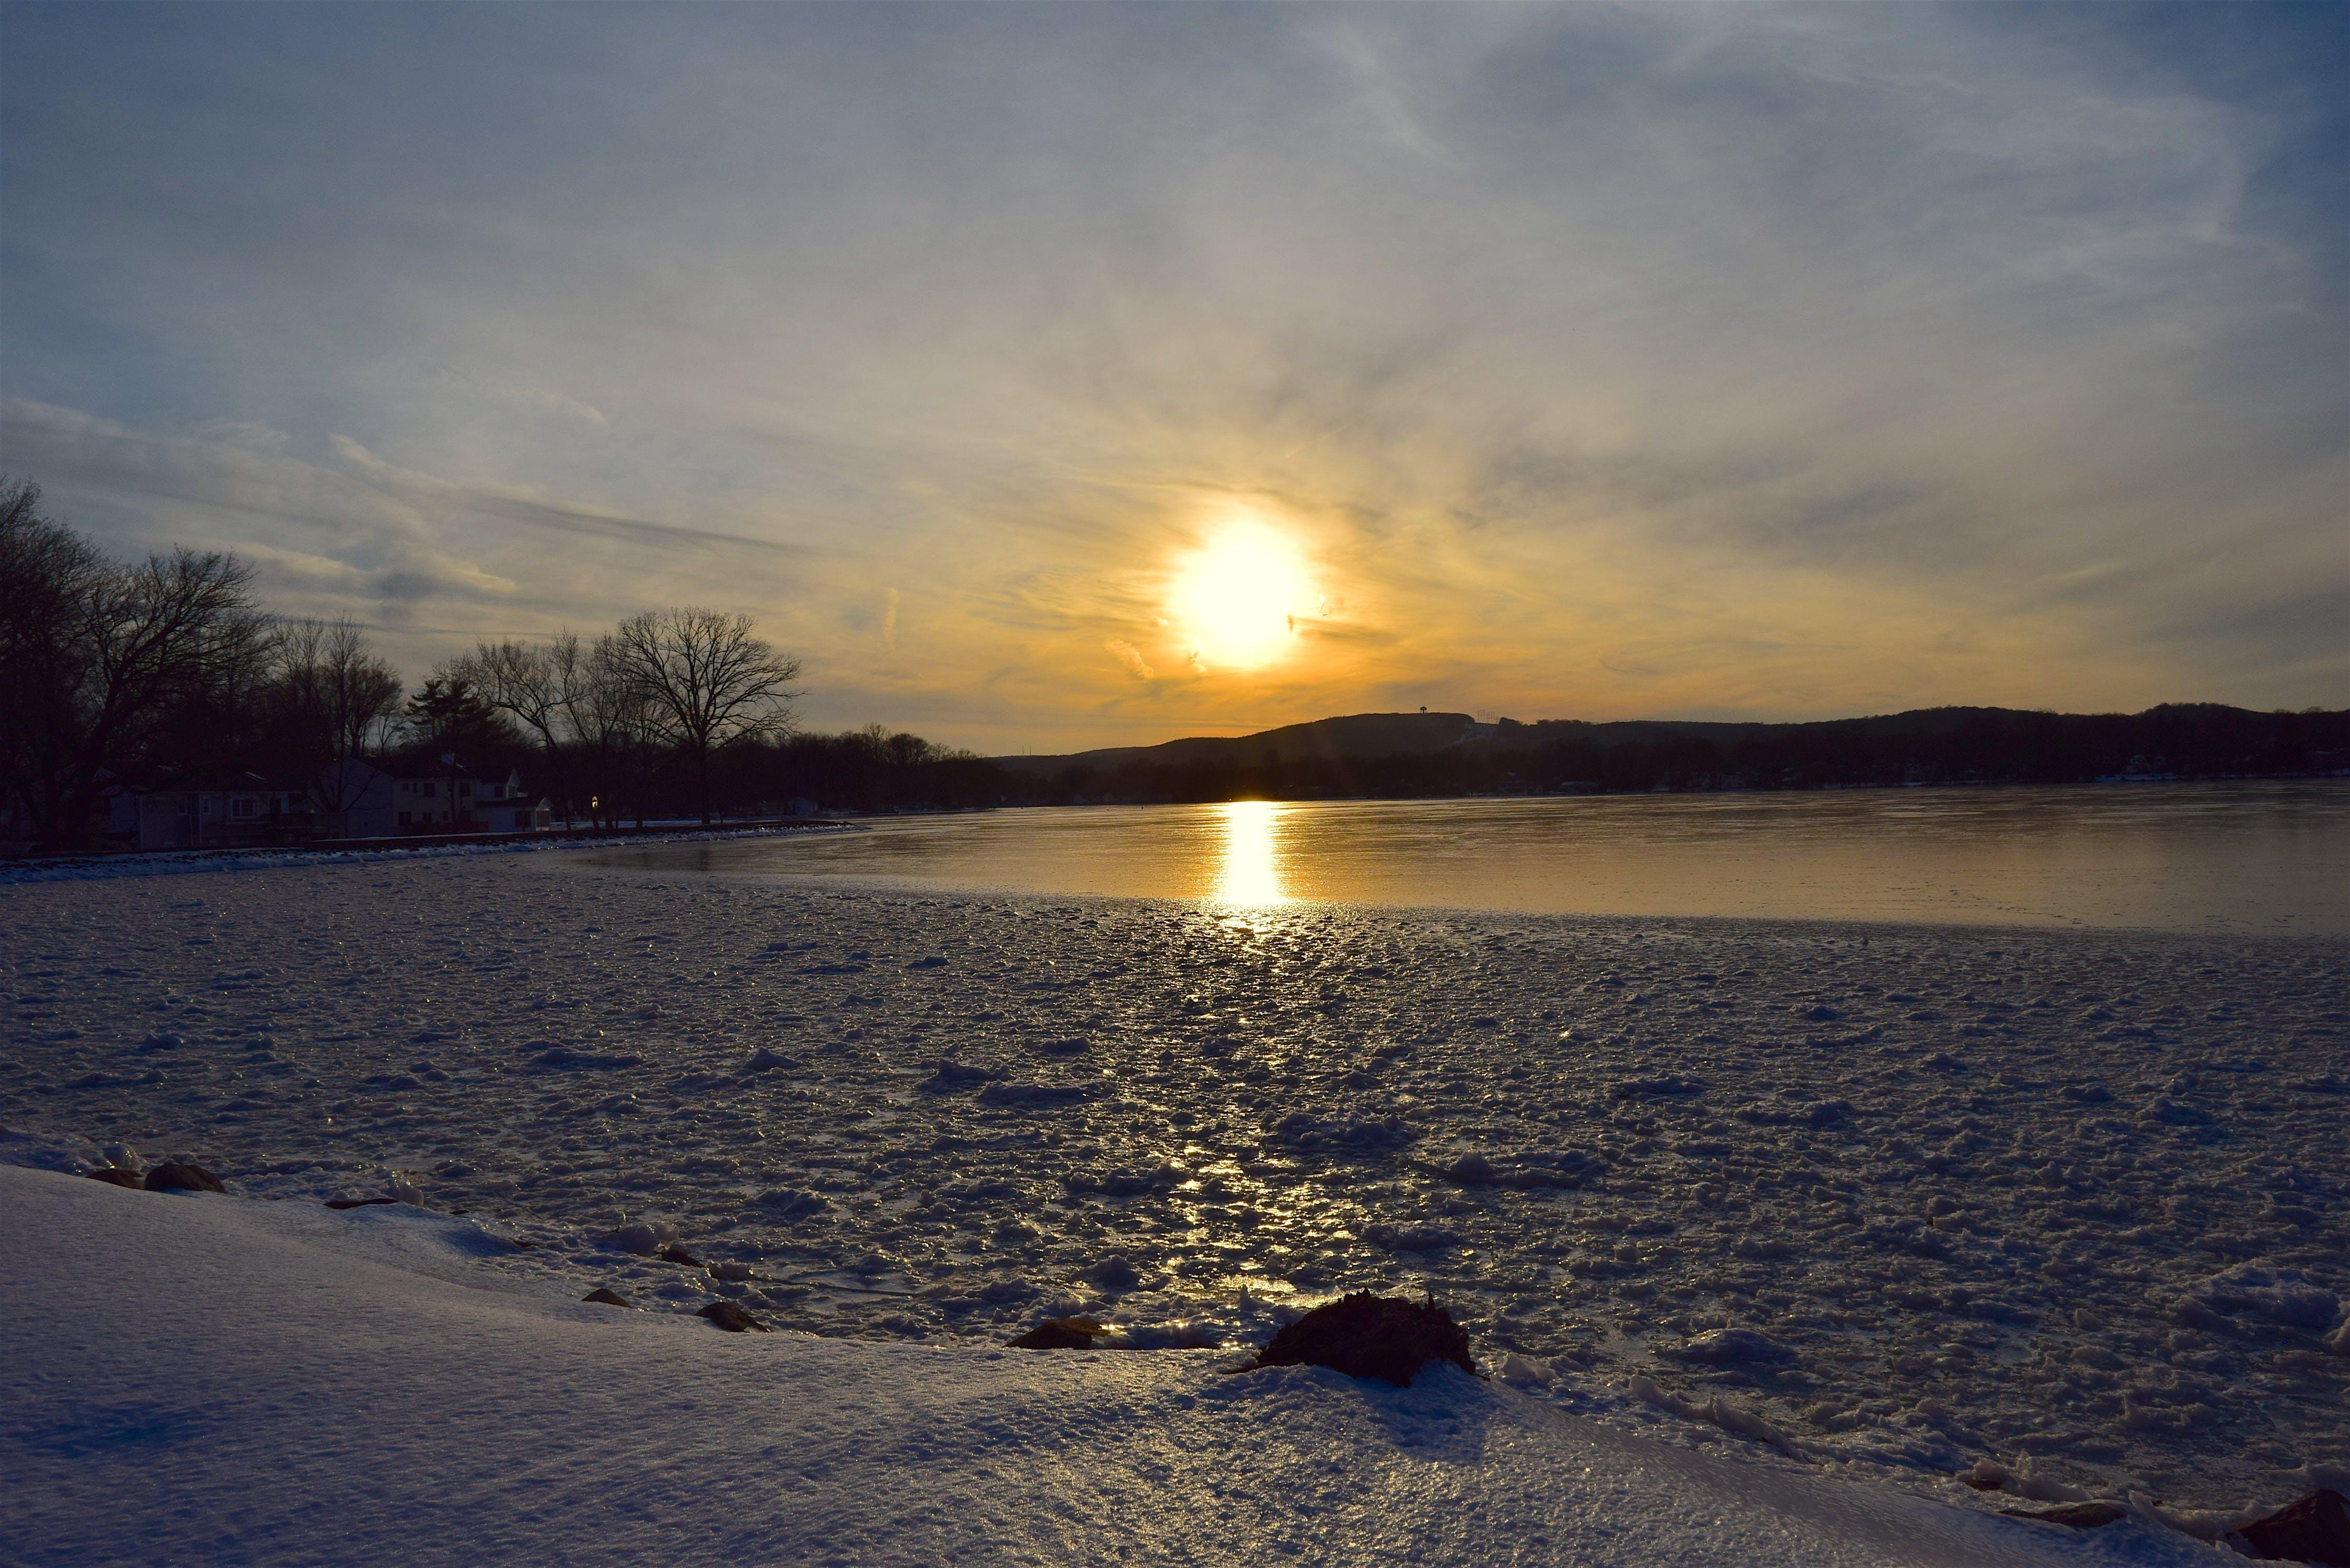 Golden Hour Photography of Seashore